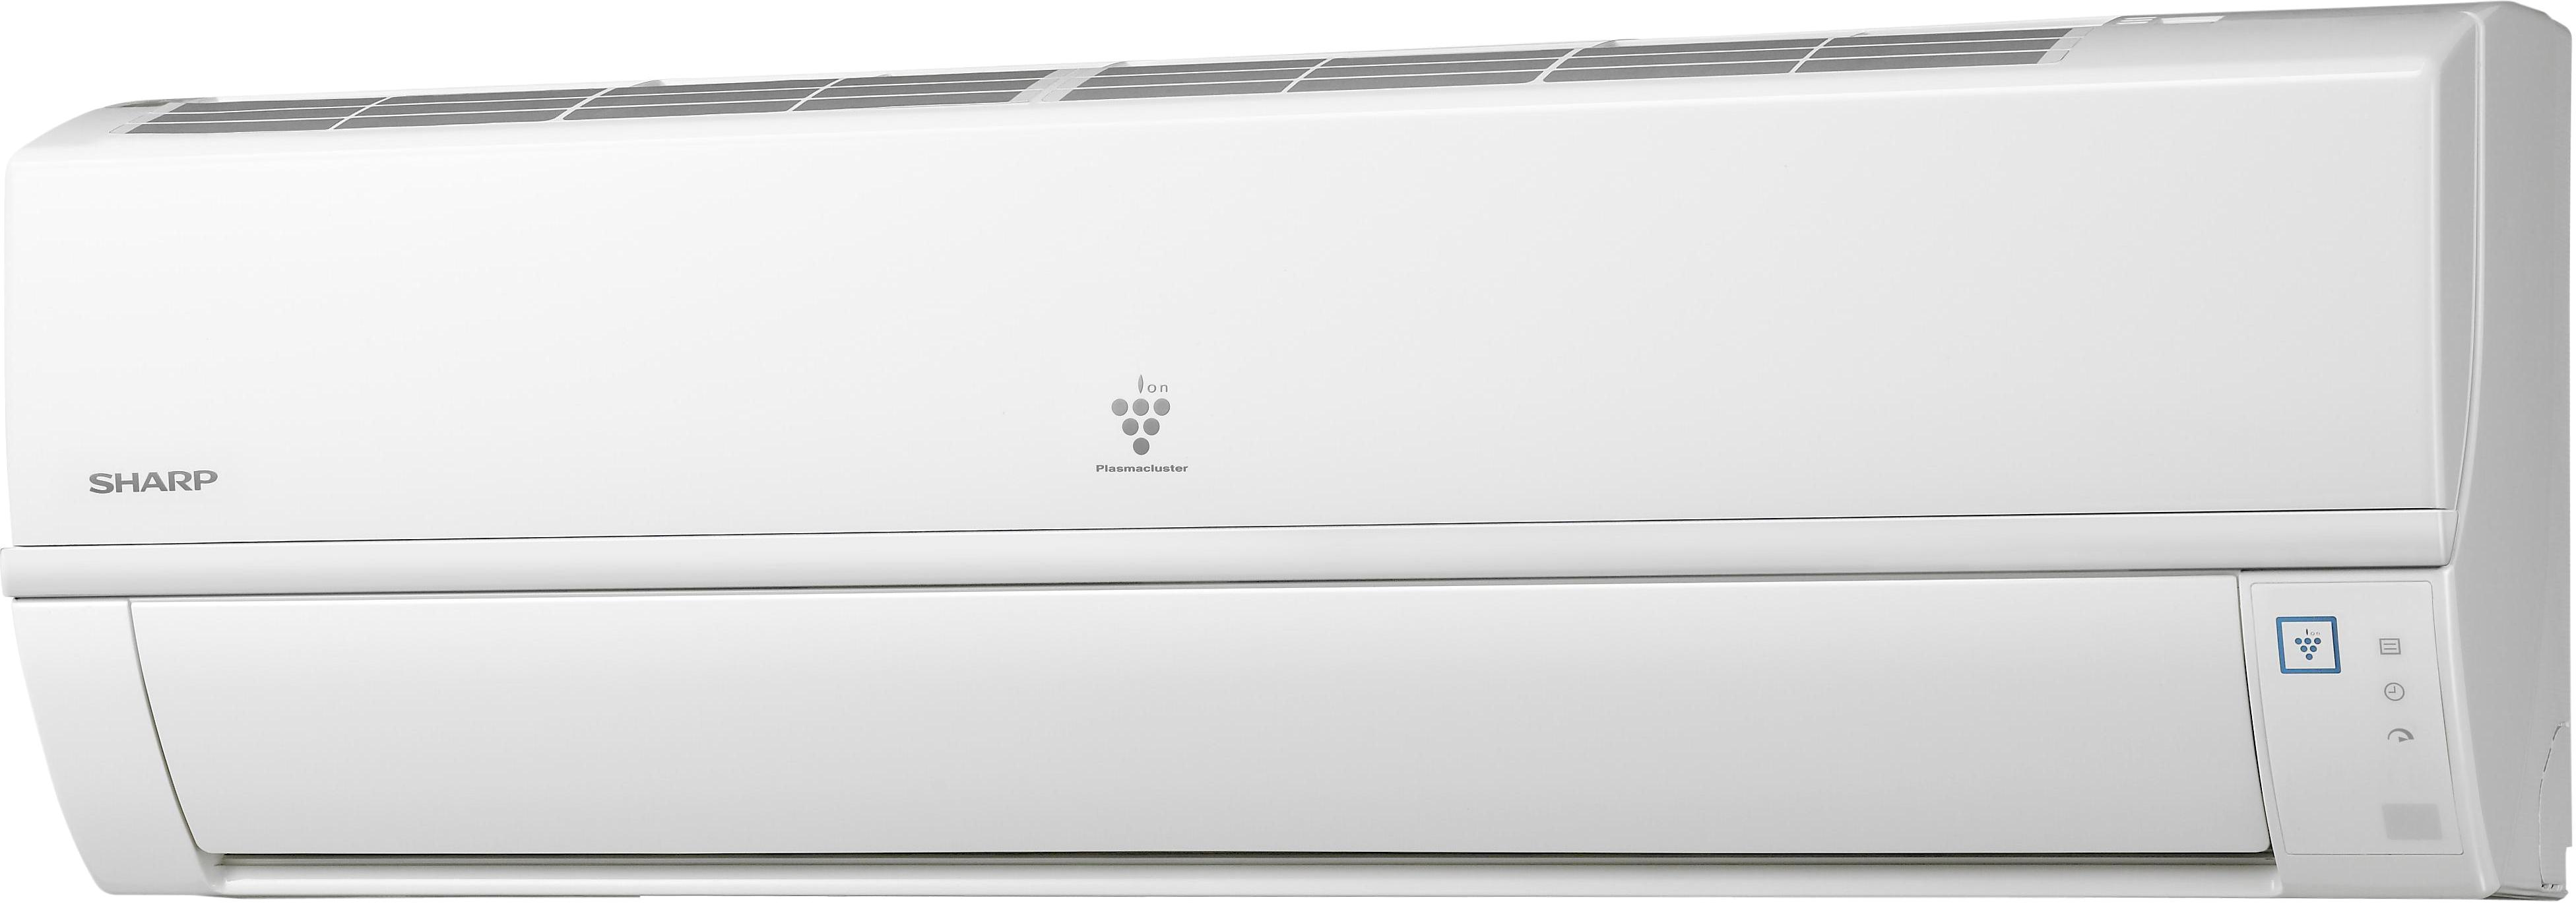 Sharp Single Split AY-XP9LSR / AE-X9LSR